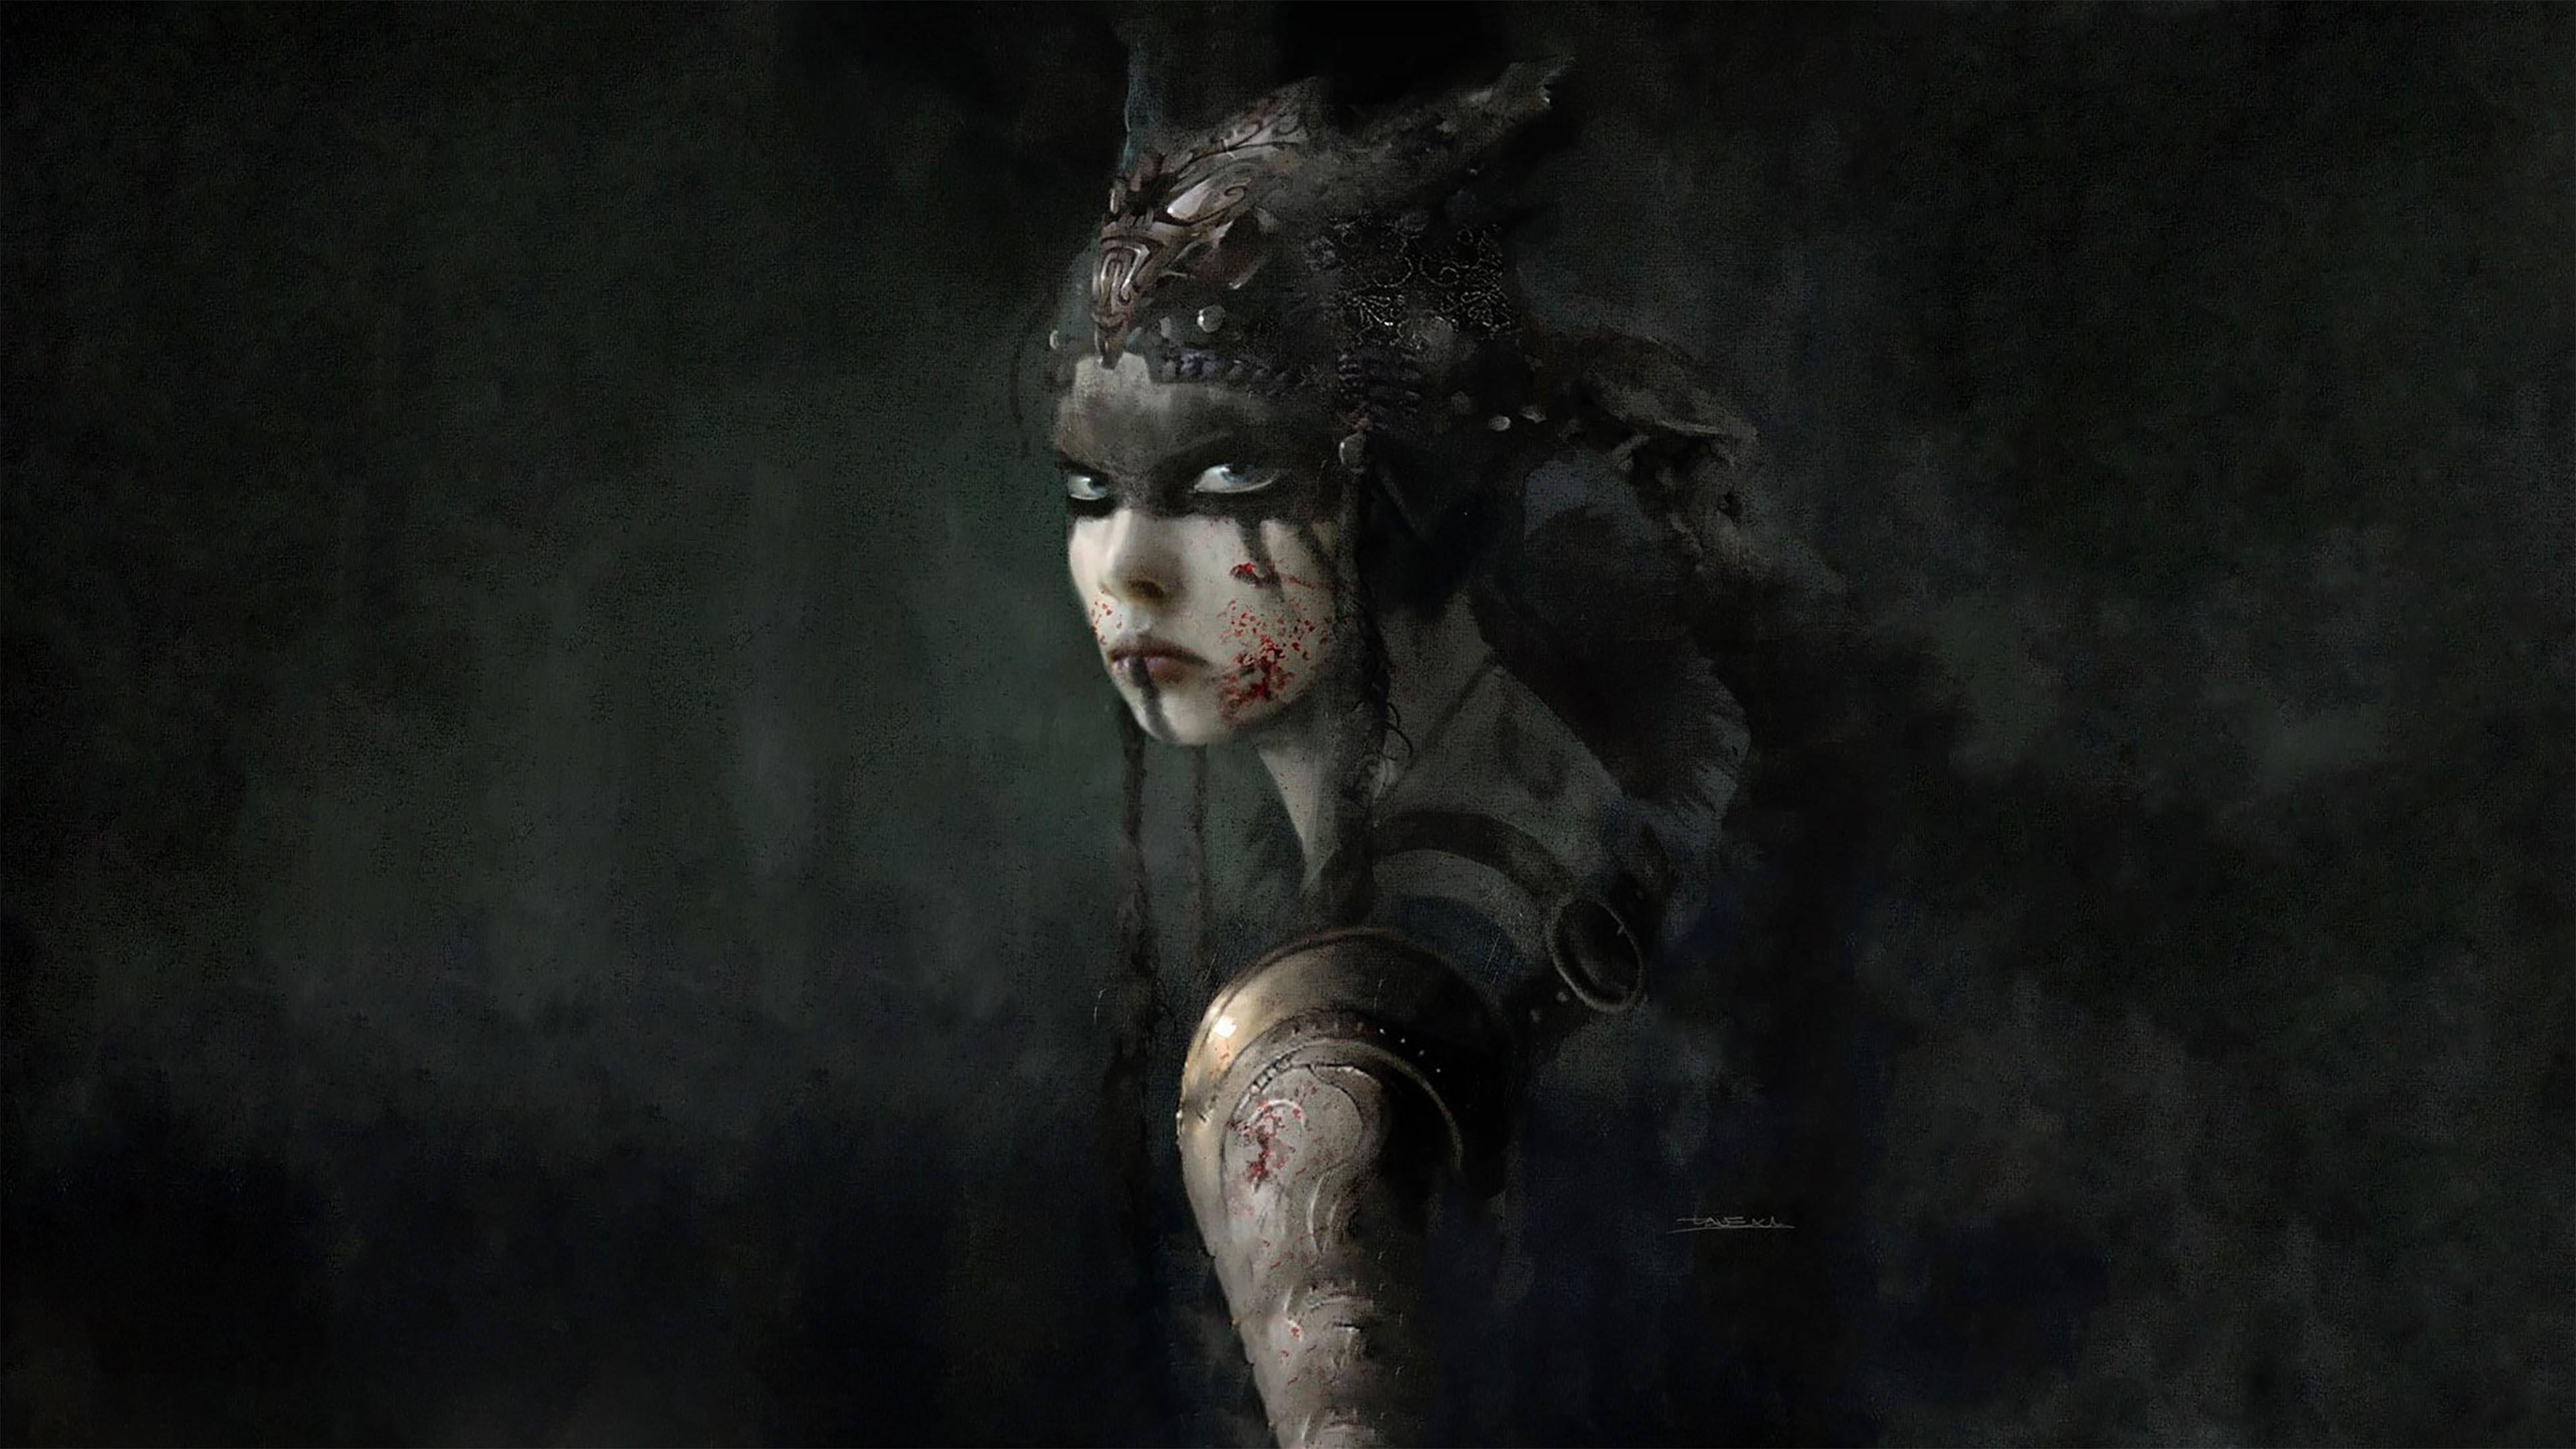 Hellblade- Senua's Sacrifice 4K Wallpaper …